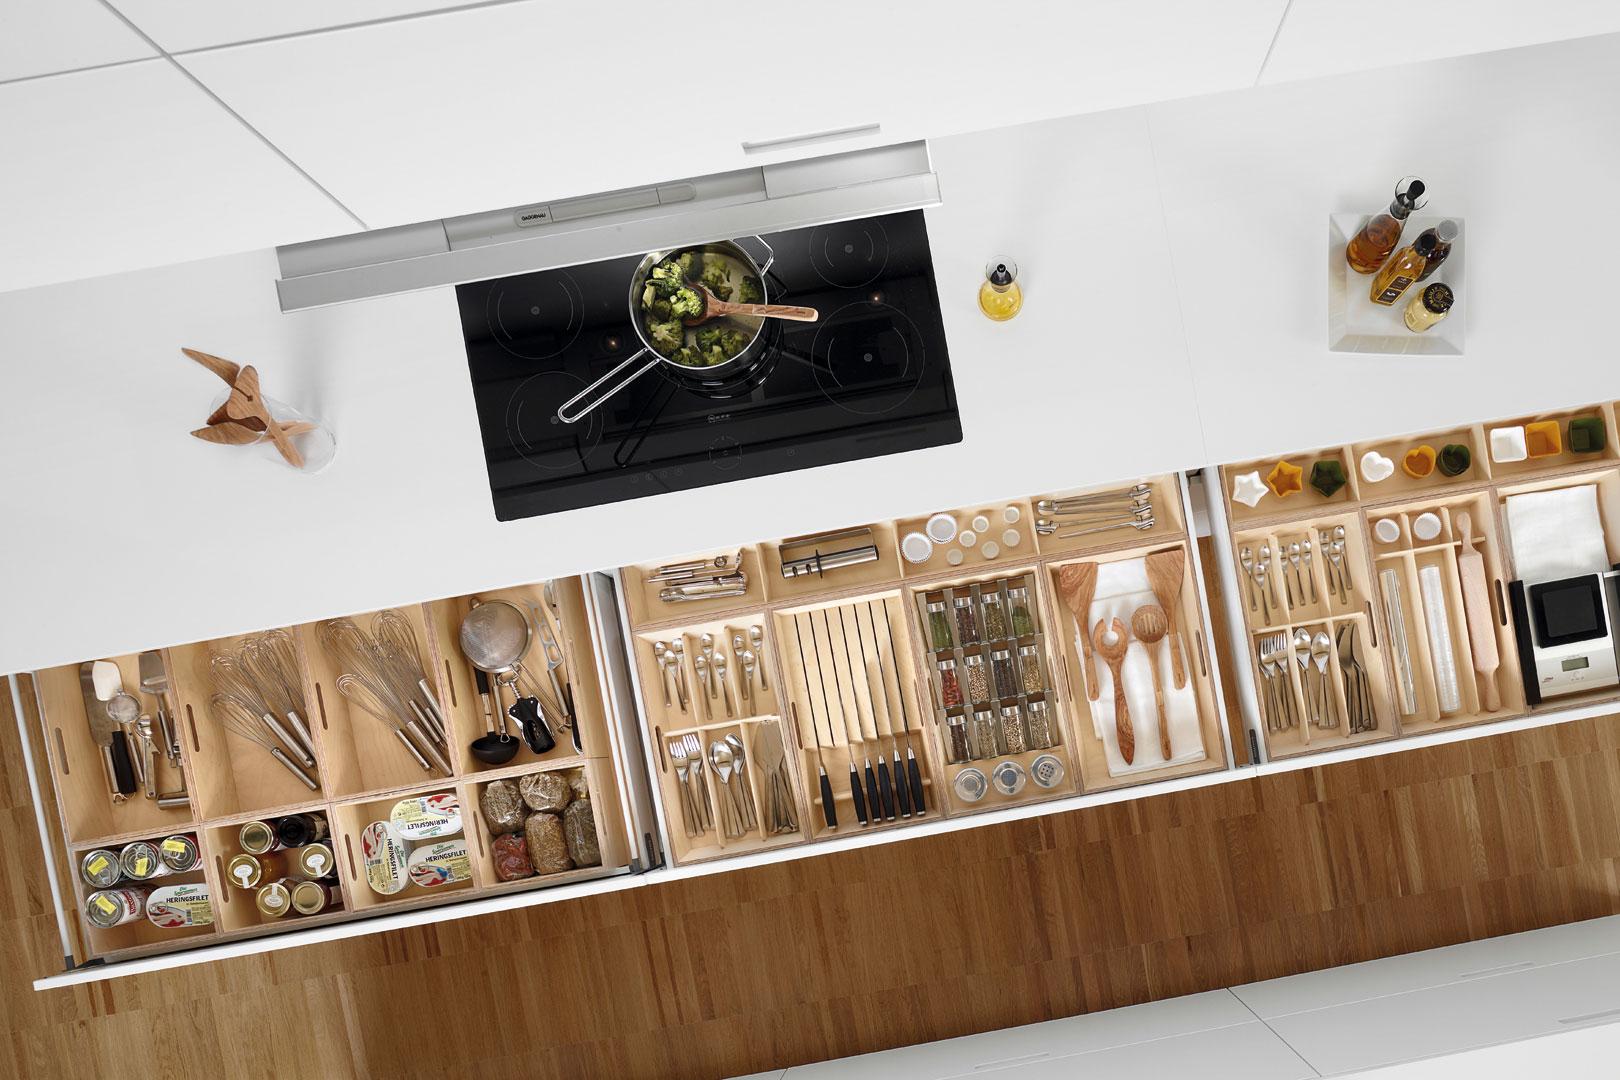 Accesorios de cocina santos orden y belleza santiago for Accesorios cocina